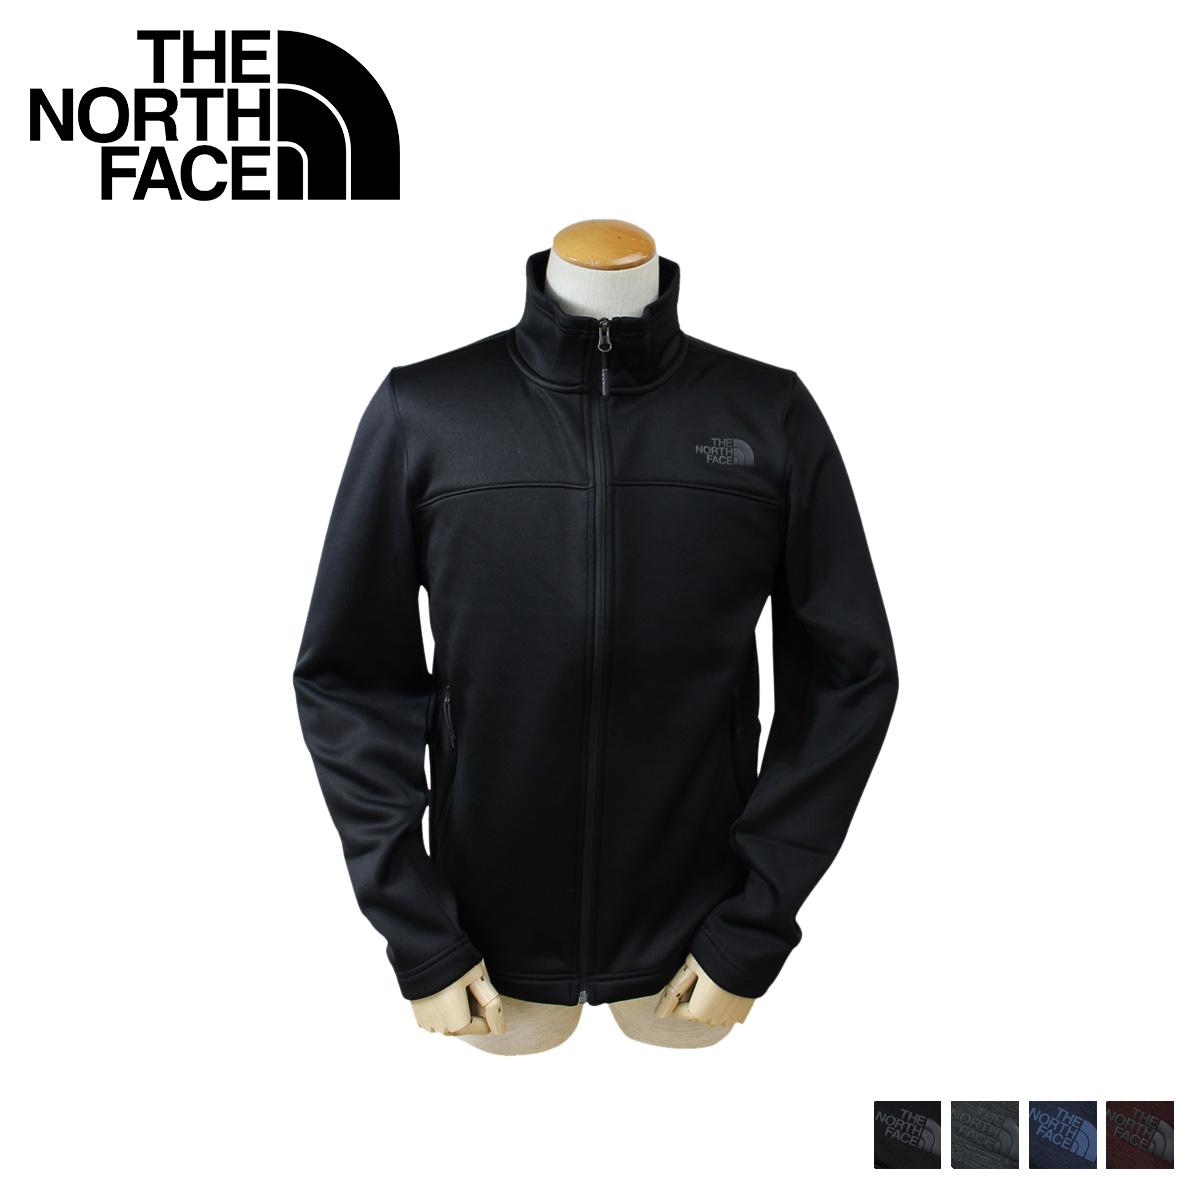 c564fae6f THE NORTH FACE north face jacket fleece MEN'S SCHENLEY FULL ZIP NF0A2RDJ